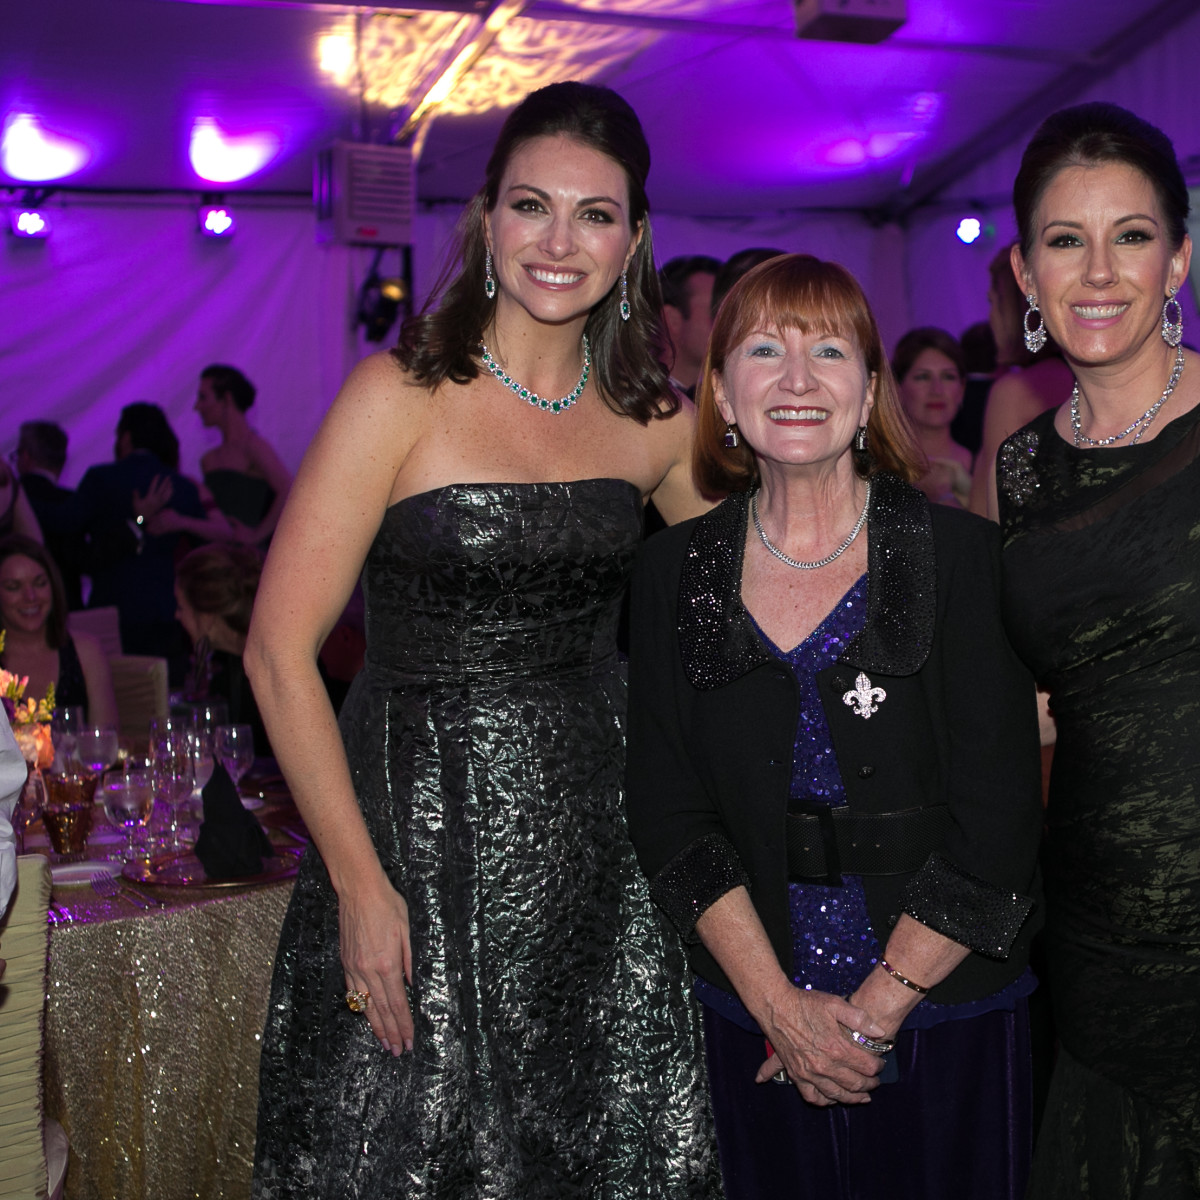 Junior League Gala, Feb. 2016, Beth Zdeblick, Kaye Horn, Mary Margaret Foerester